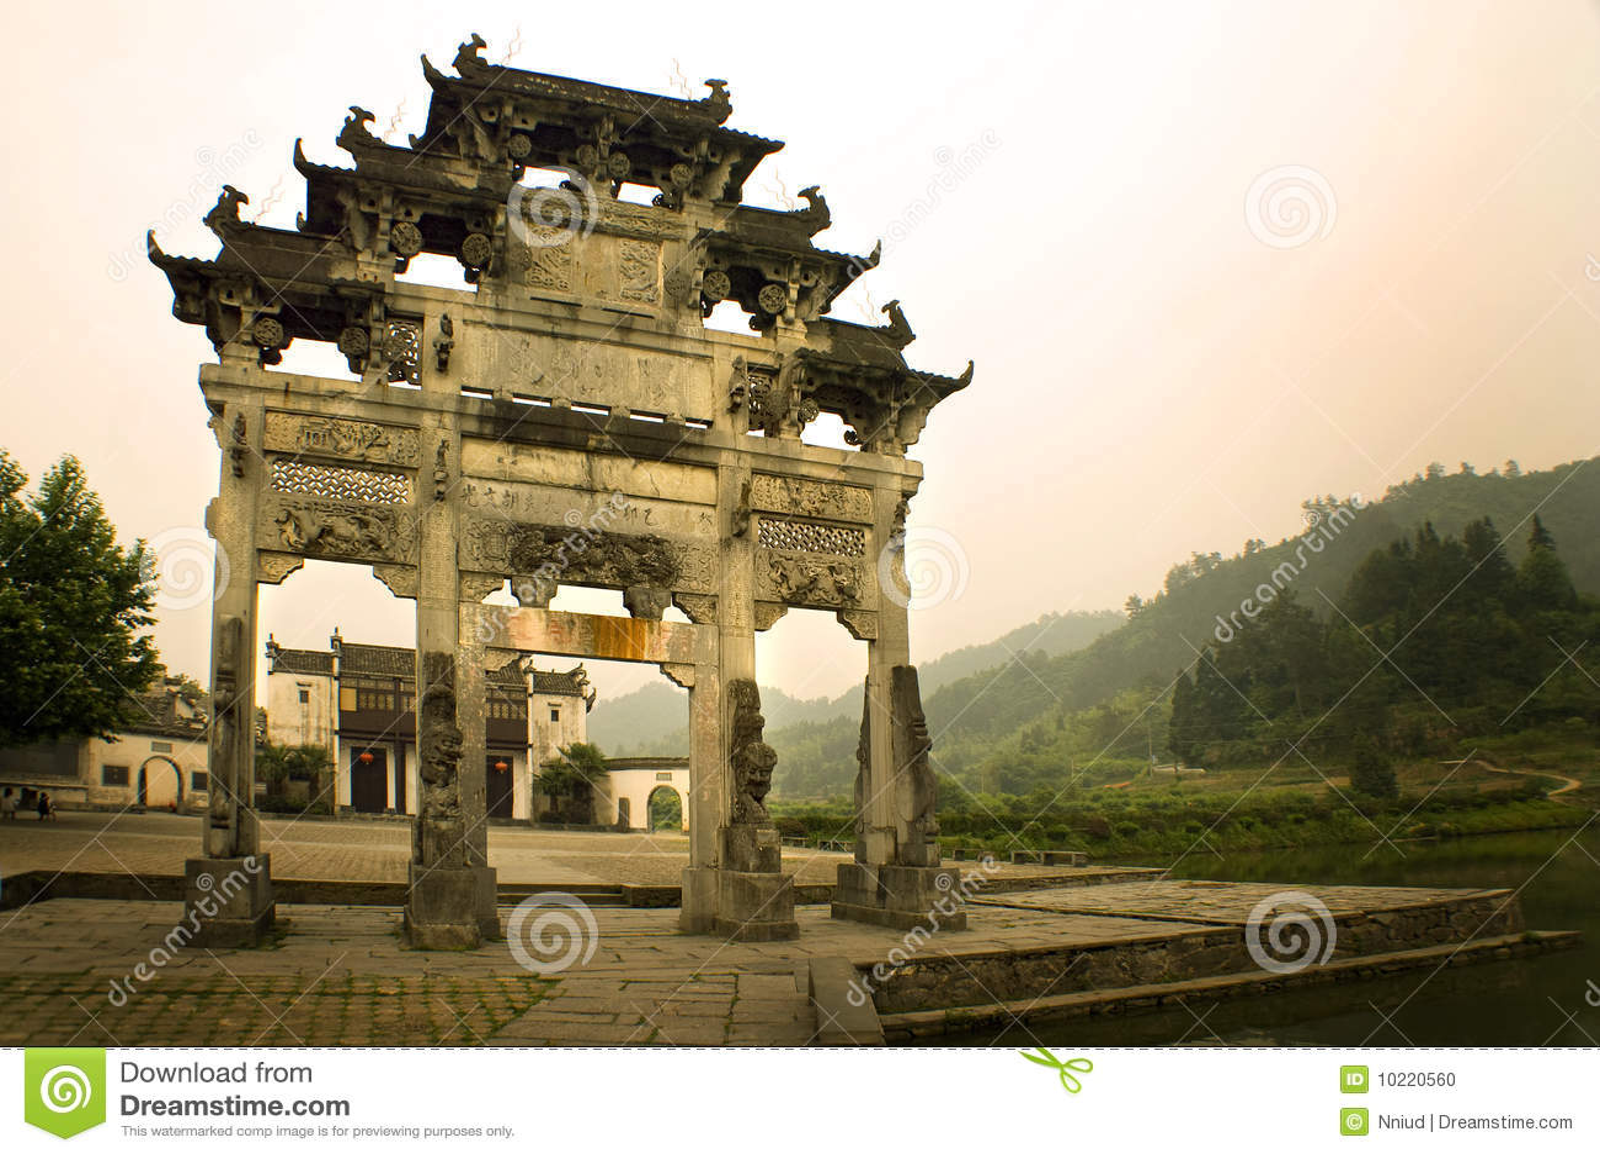 Entrance Gate To Xidi Village South China Stock Photo